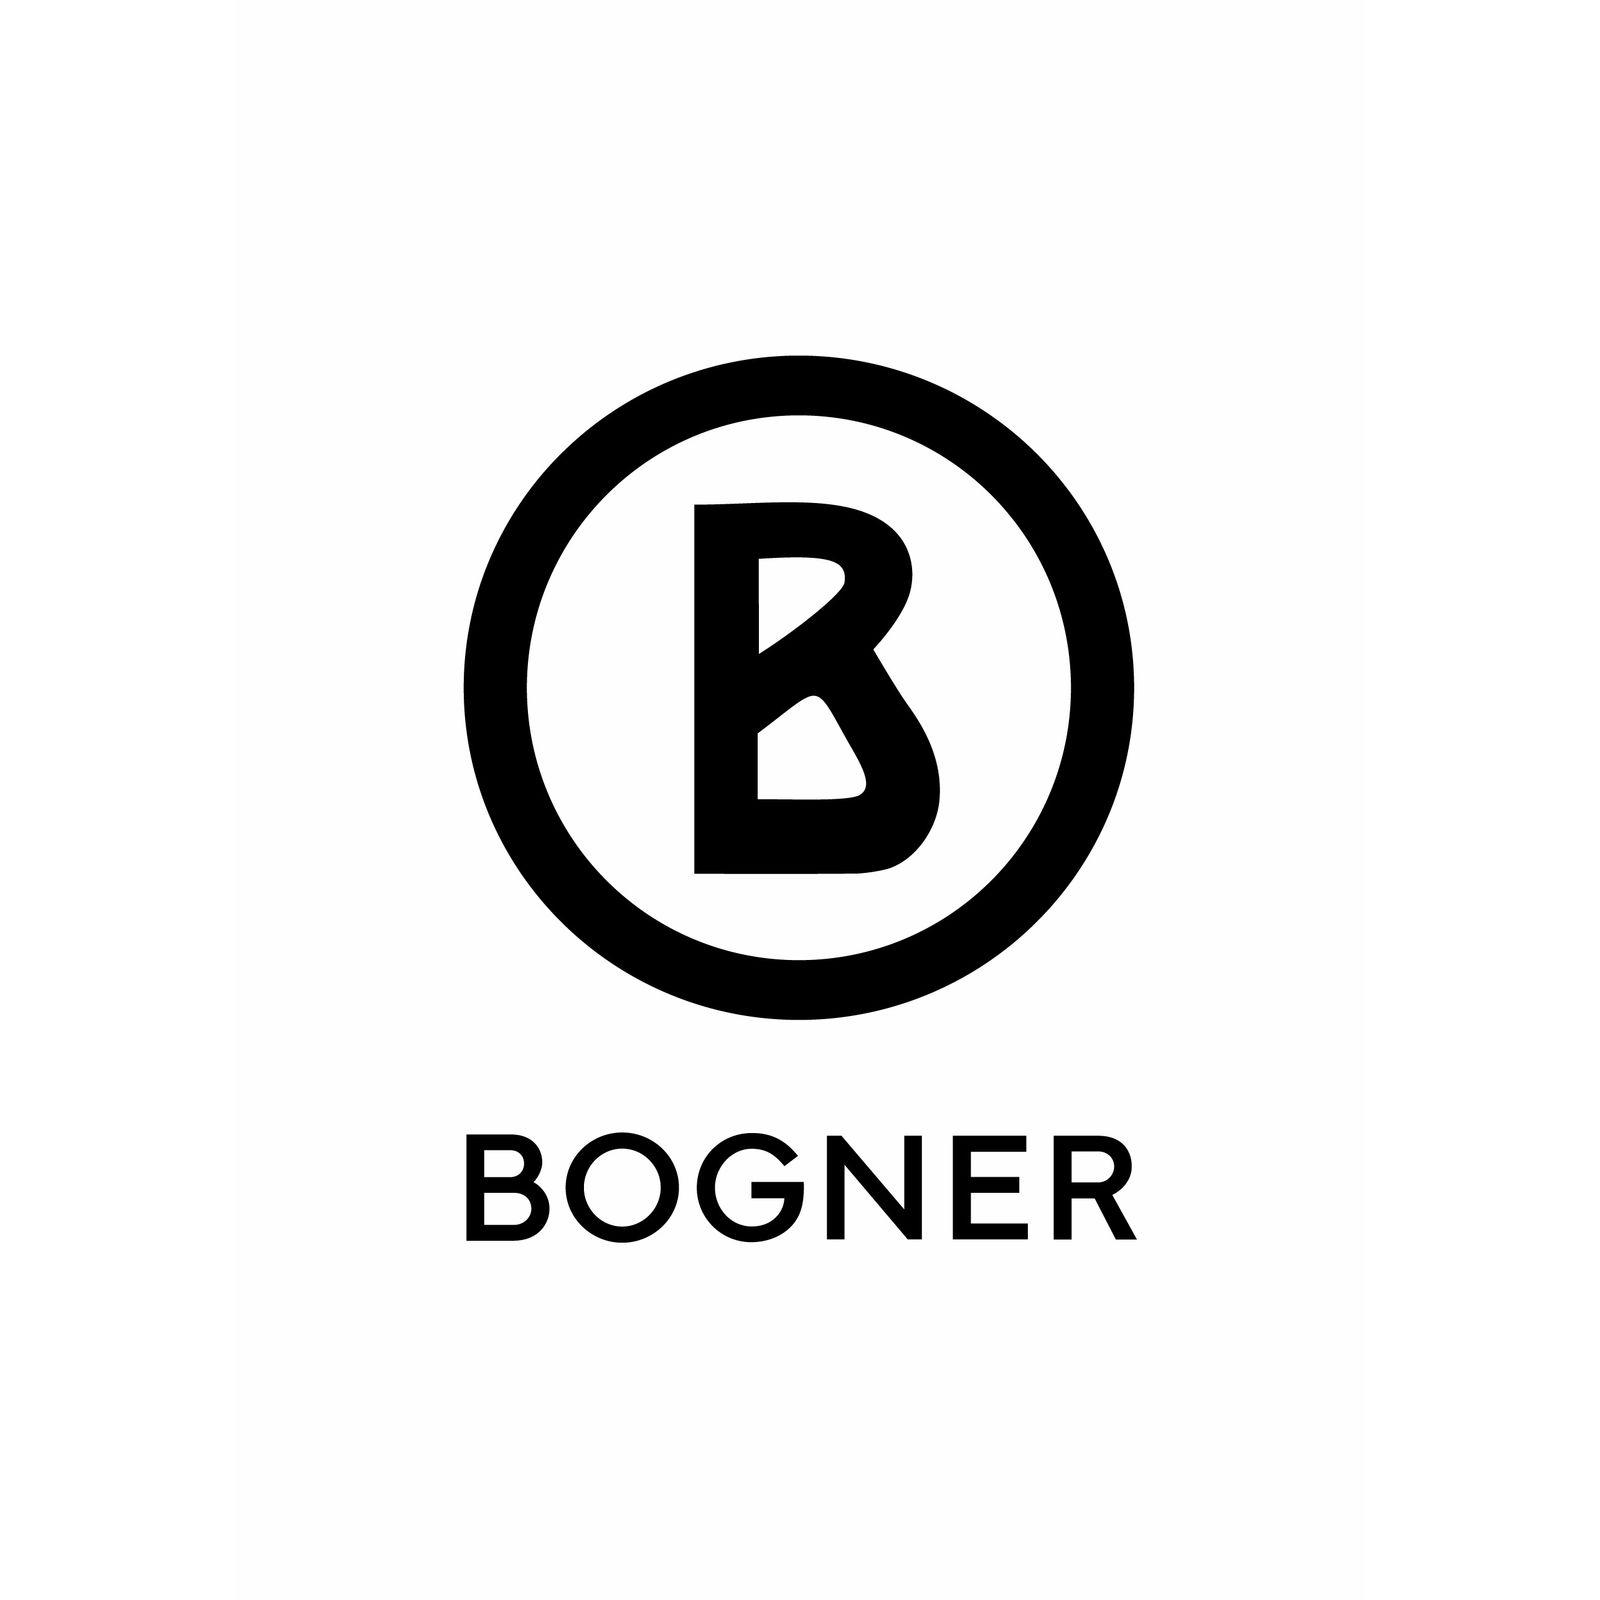 BOGNER Man (Bild 1)